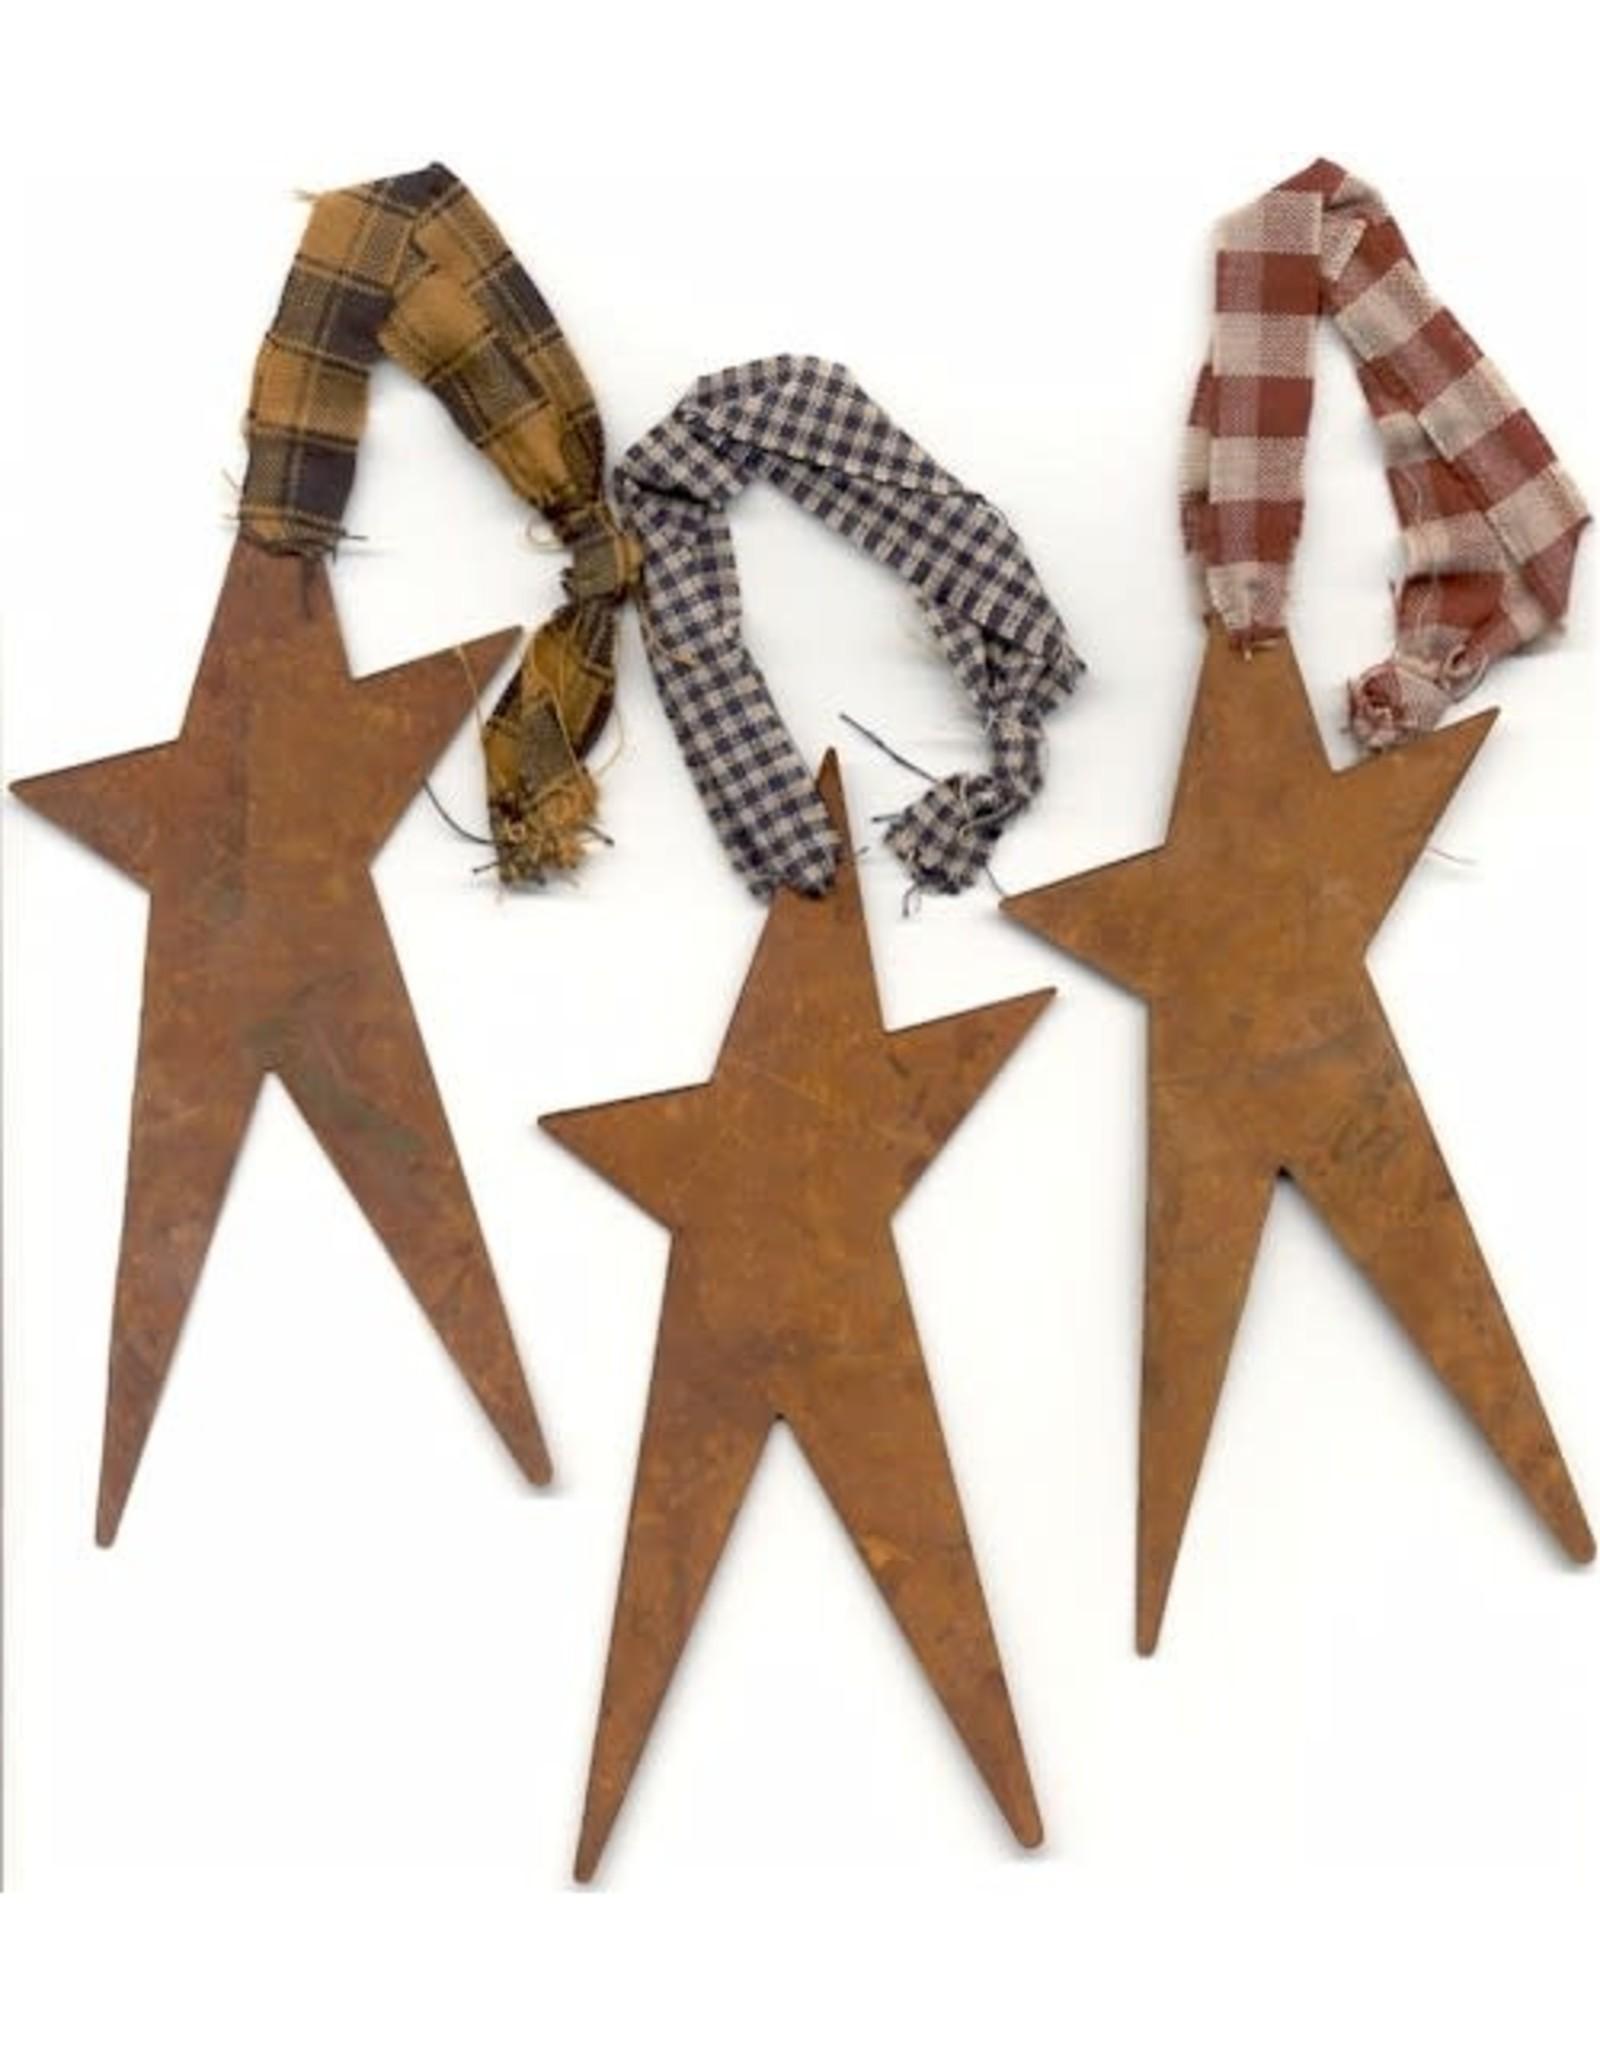 "RUSTY TIN STAR 5 1/2"" WITH HOMESPUN FABRIC (MUSTARD) PACKAGED 12"